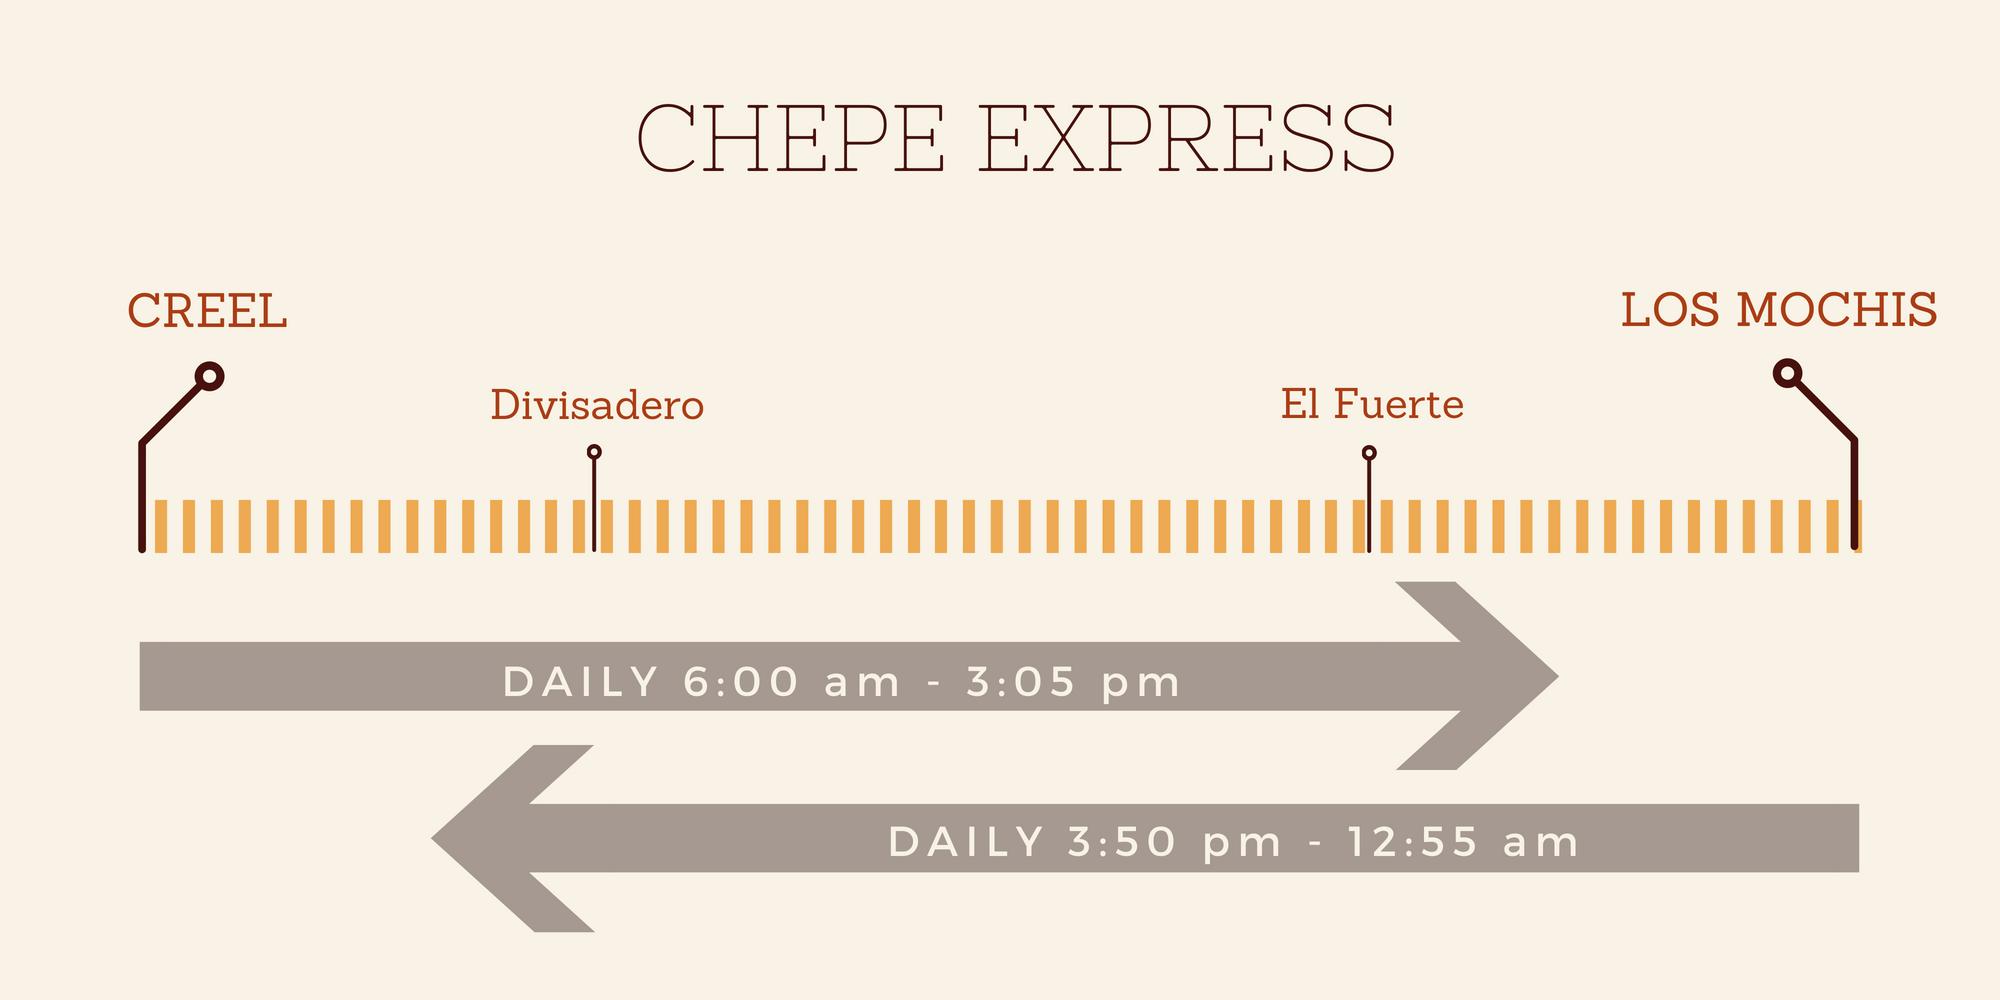 Copper Canyon Train - Chepe Express Schedule